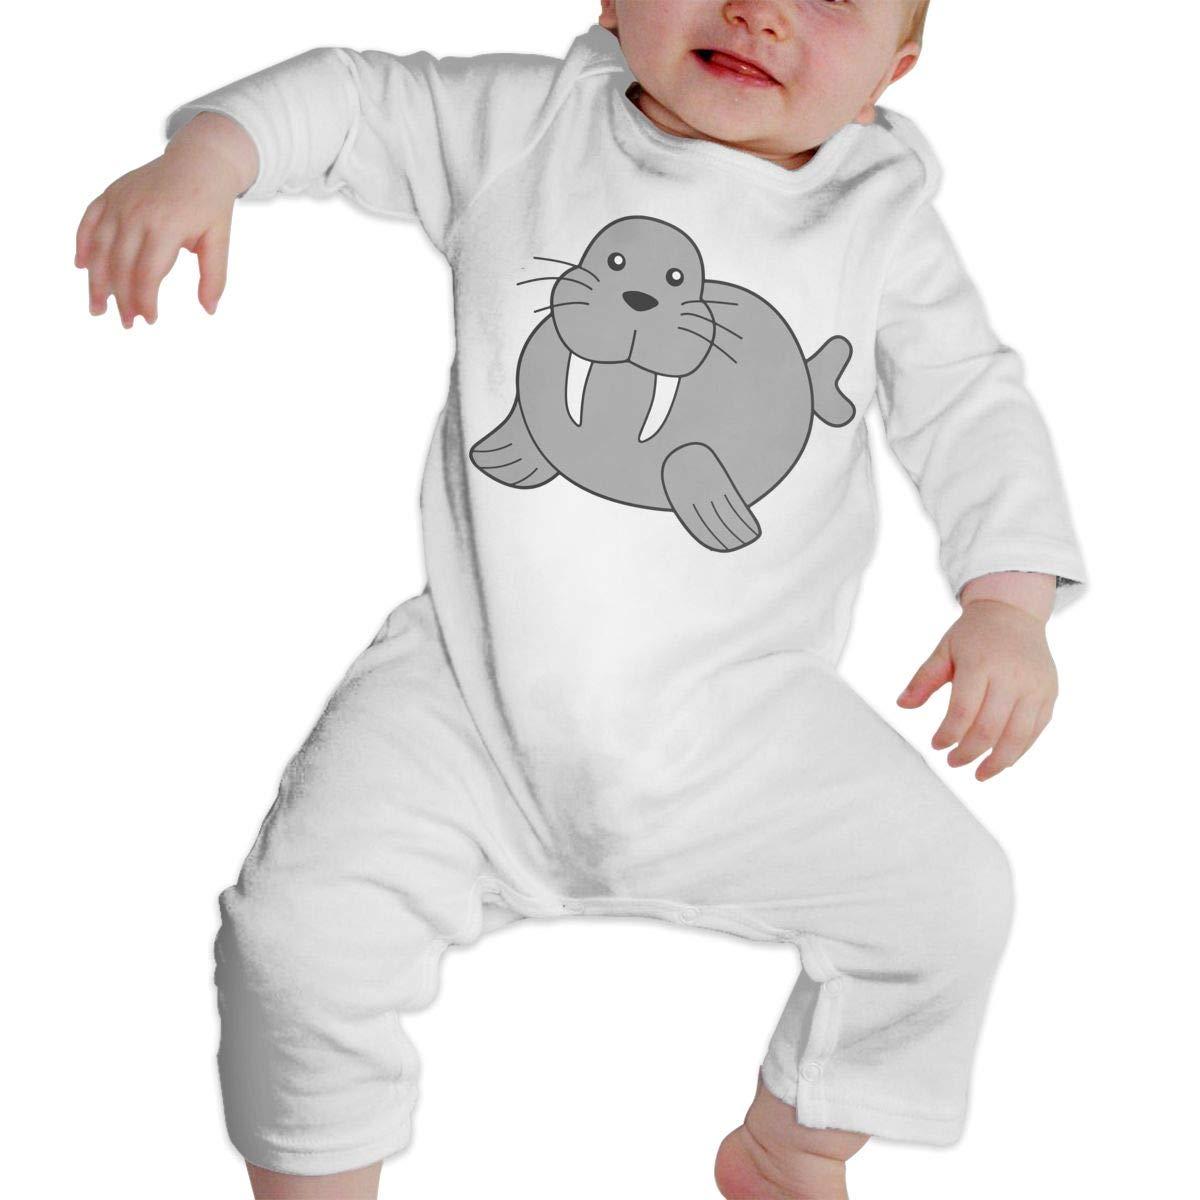 A1BY-5US Infant Babys Cotton Long Sleeve Walrus Climb Jumpsuit One-Piece Romper Clothes